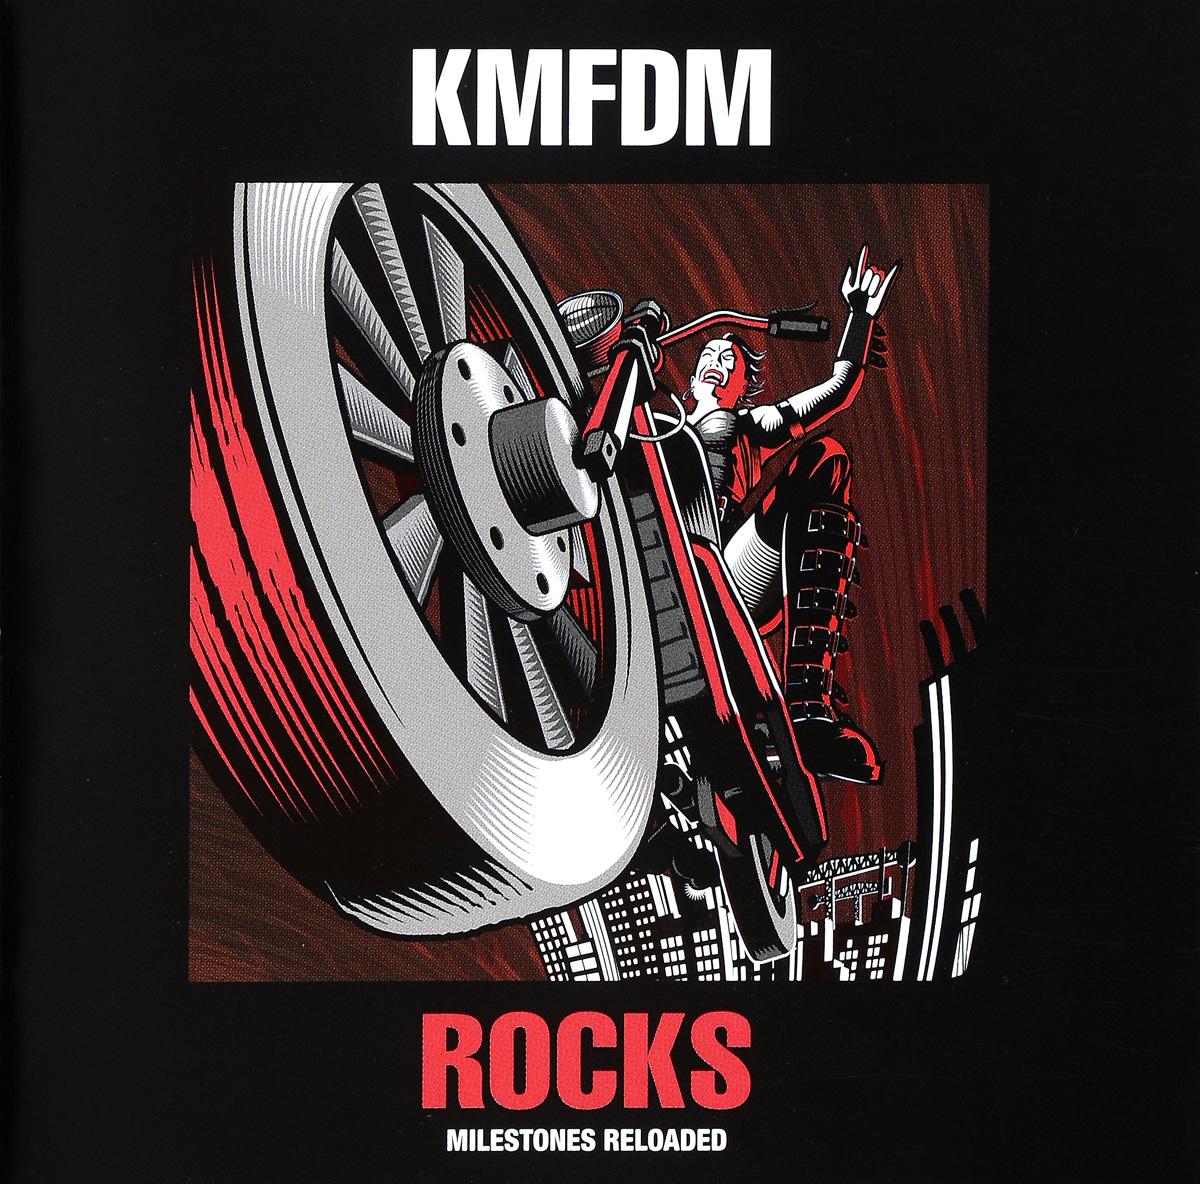 KMFDM KMFDM. Rocks. Milestones Reloaded kmfdm kmfdm rocks milestones reloaded